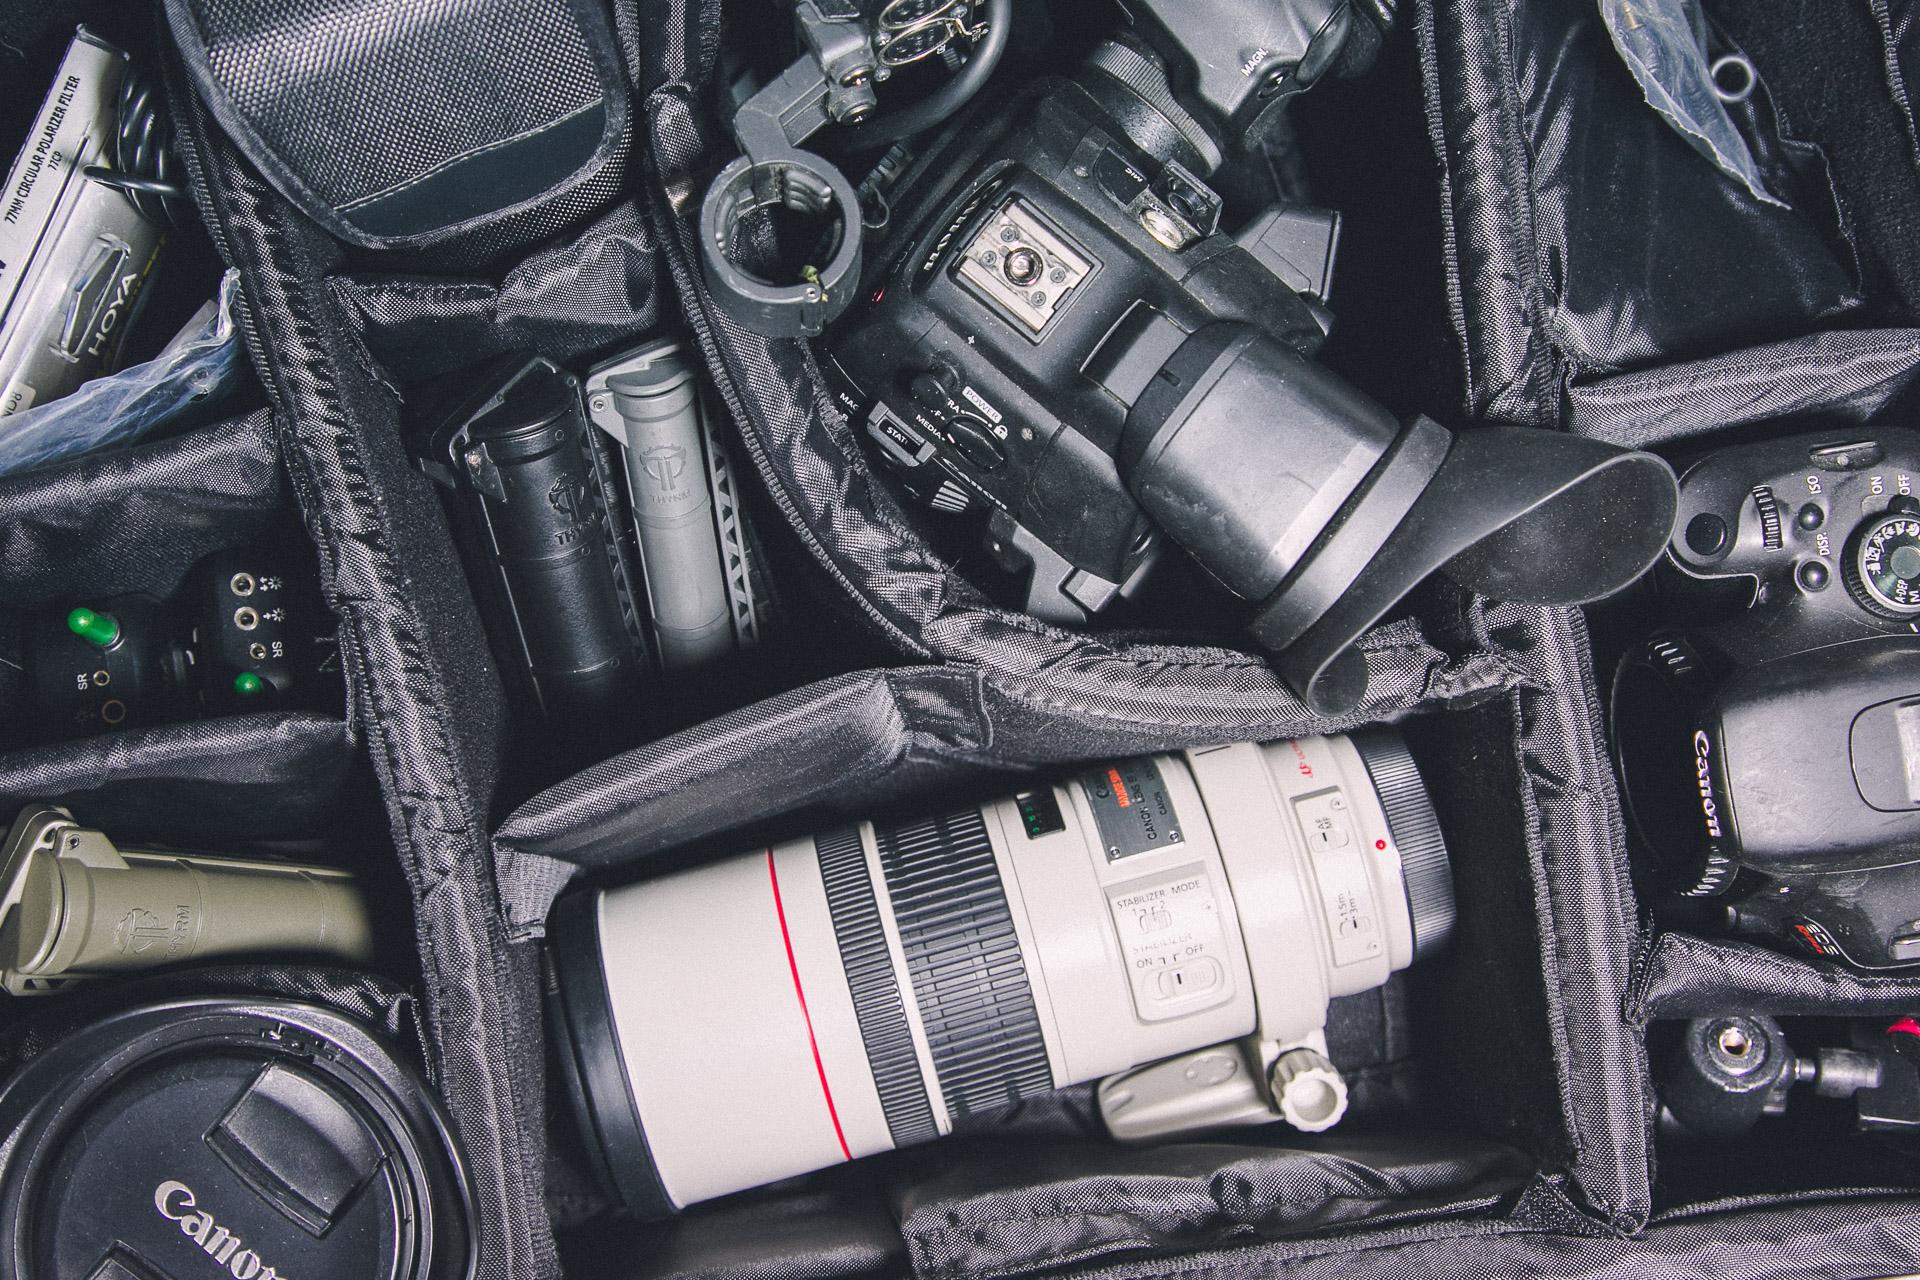 CellVault XL - Camera Case